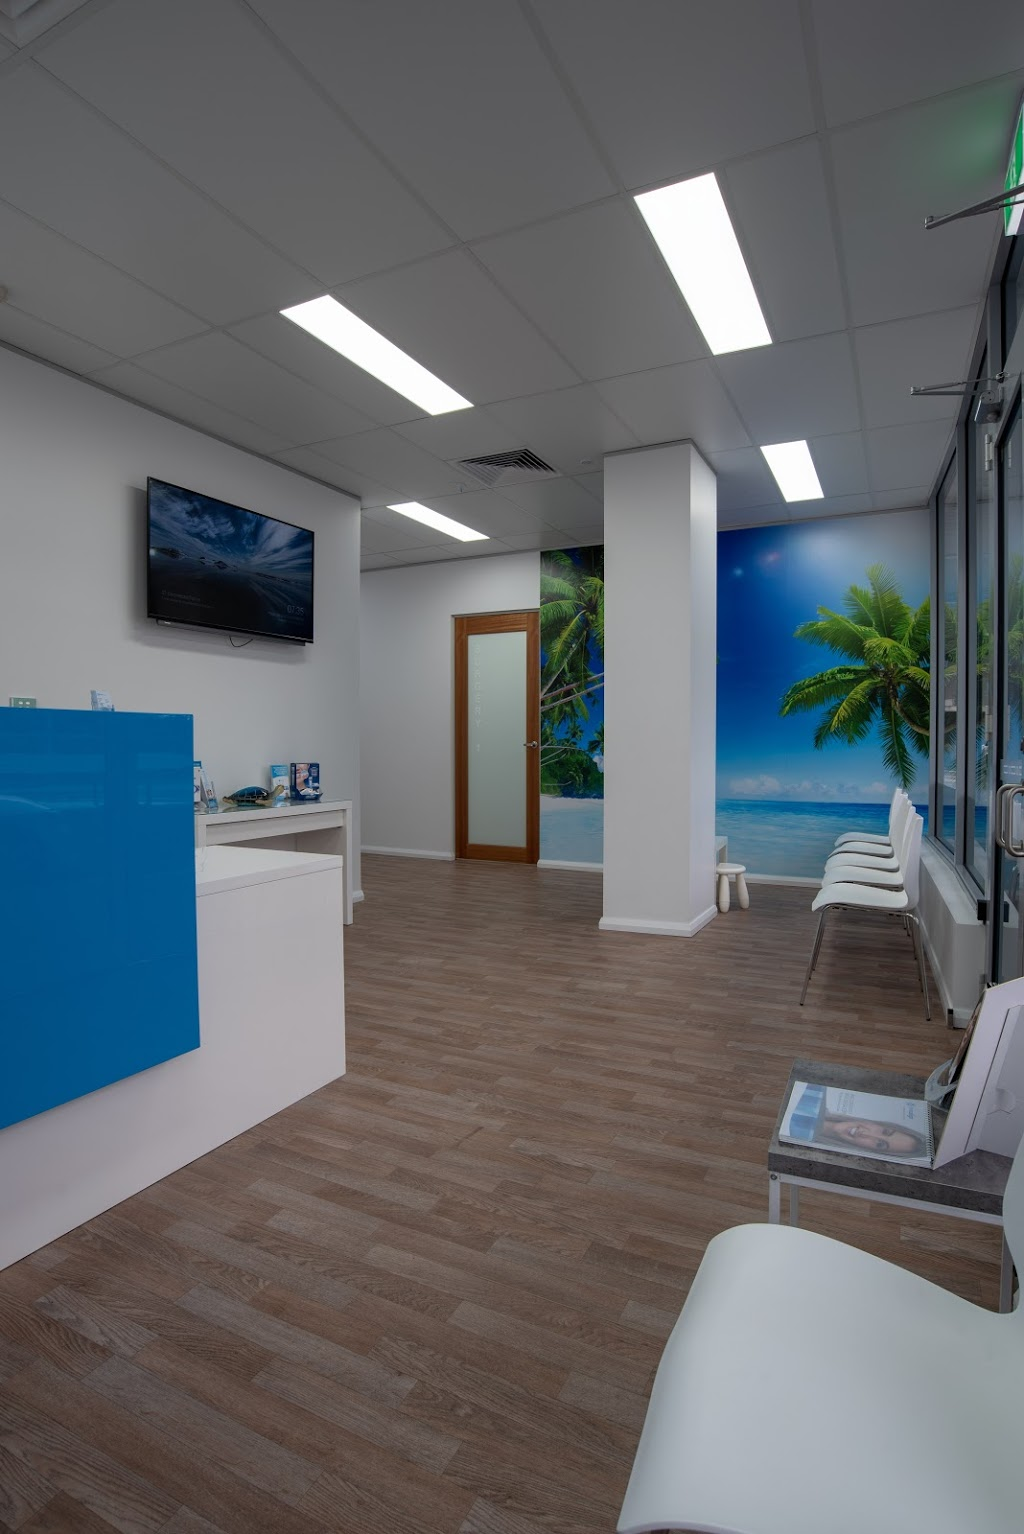 impressiveSMILES - Dr Mardiros Tatian | dentist | Shop 4/51 Bonnyrigg Ave, Bonnyrigg NSW 2177, Australia | 0287113400 OR +61 2 8711 3400